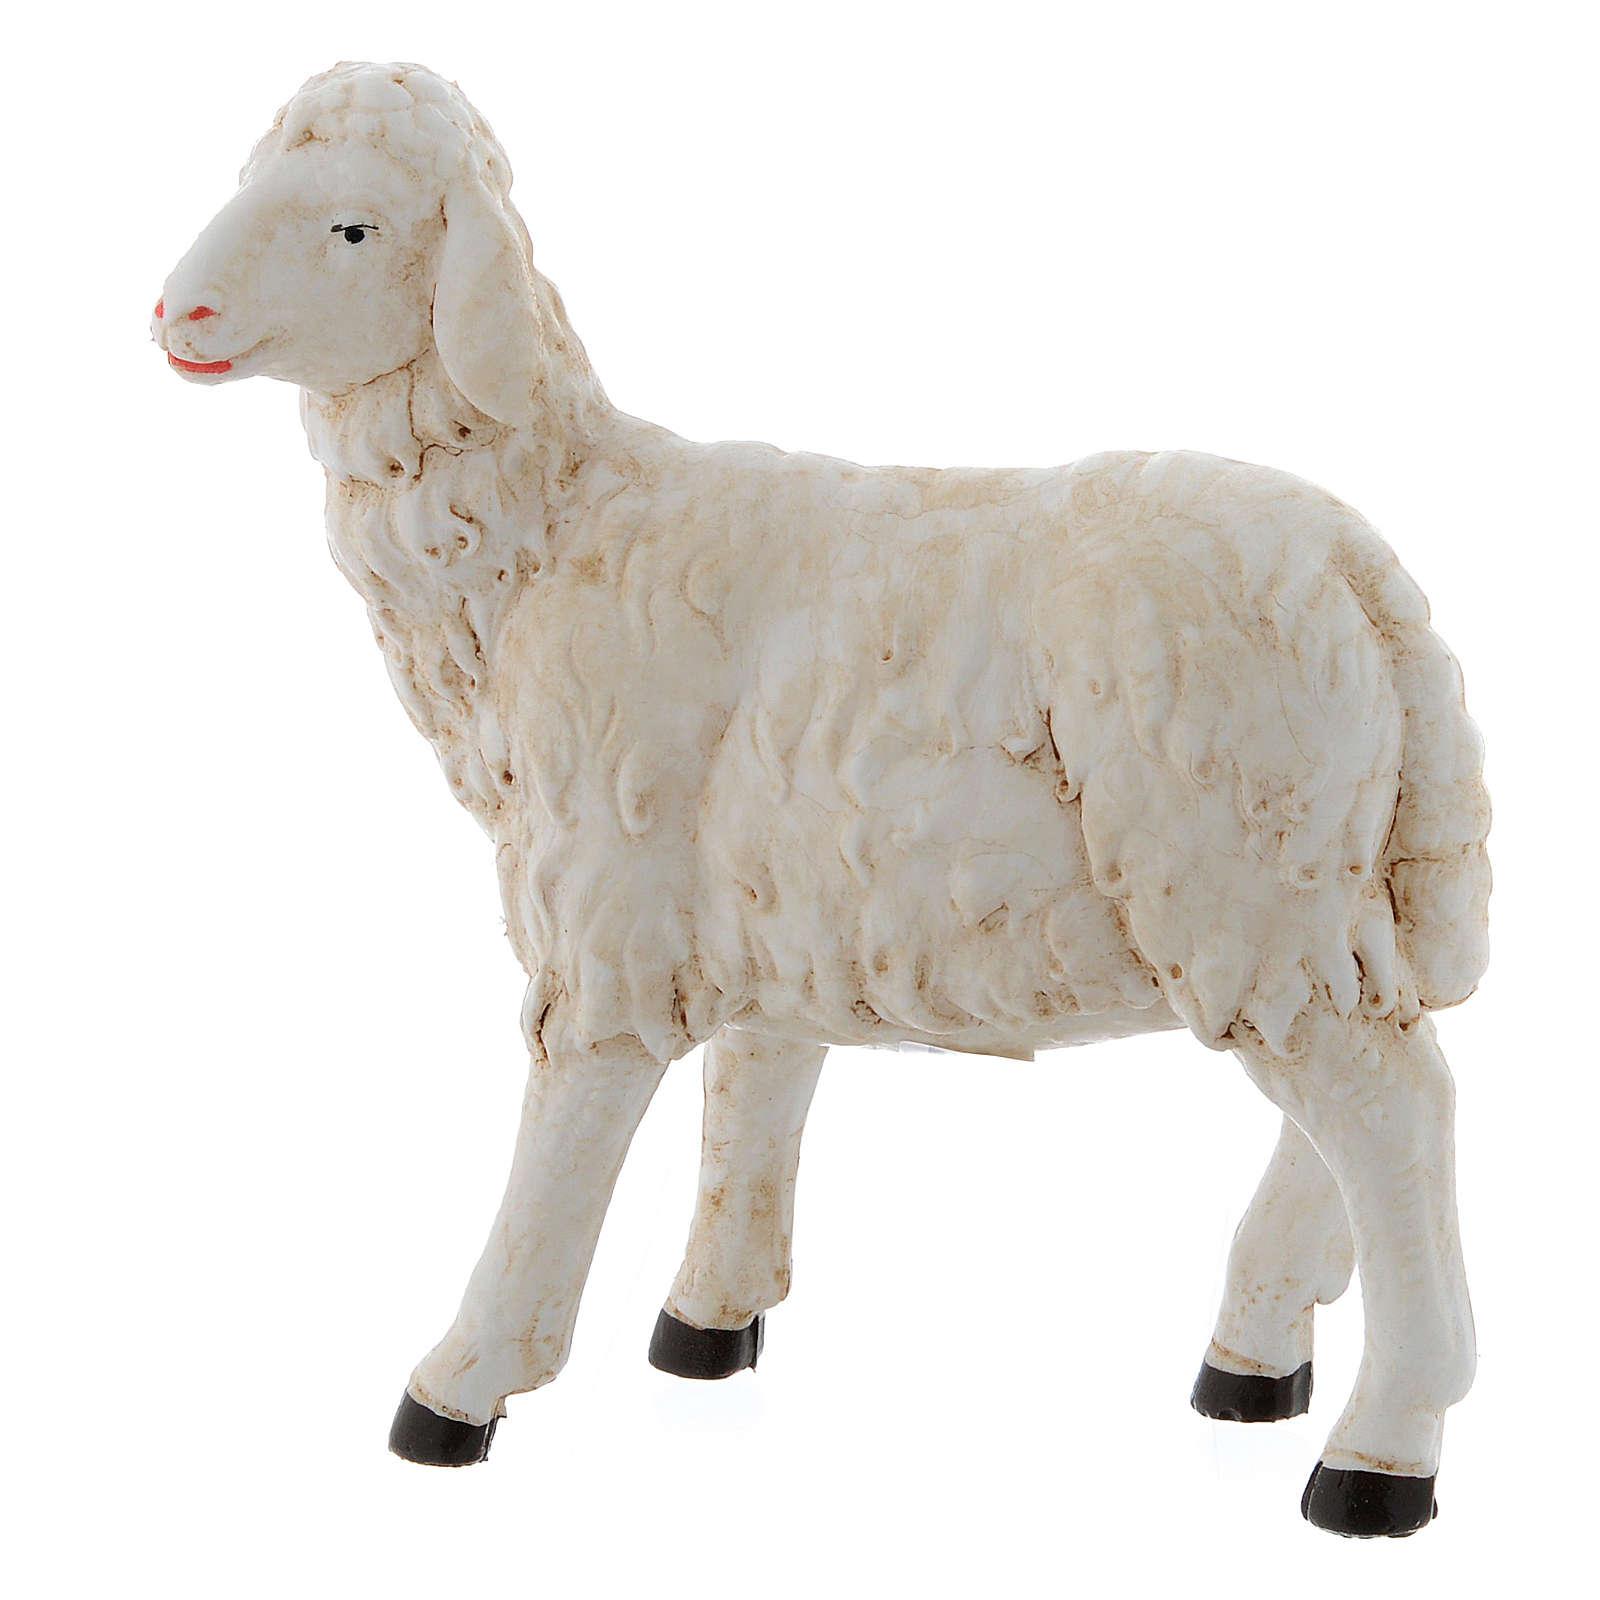 Pecorelle per presepe set da 3 pezzi 40-45 cm 3